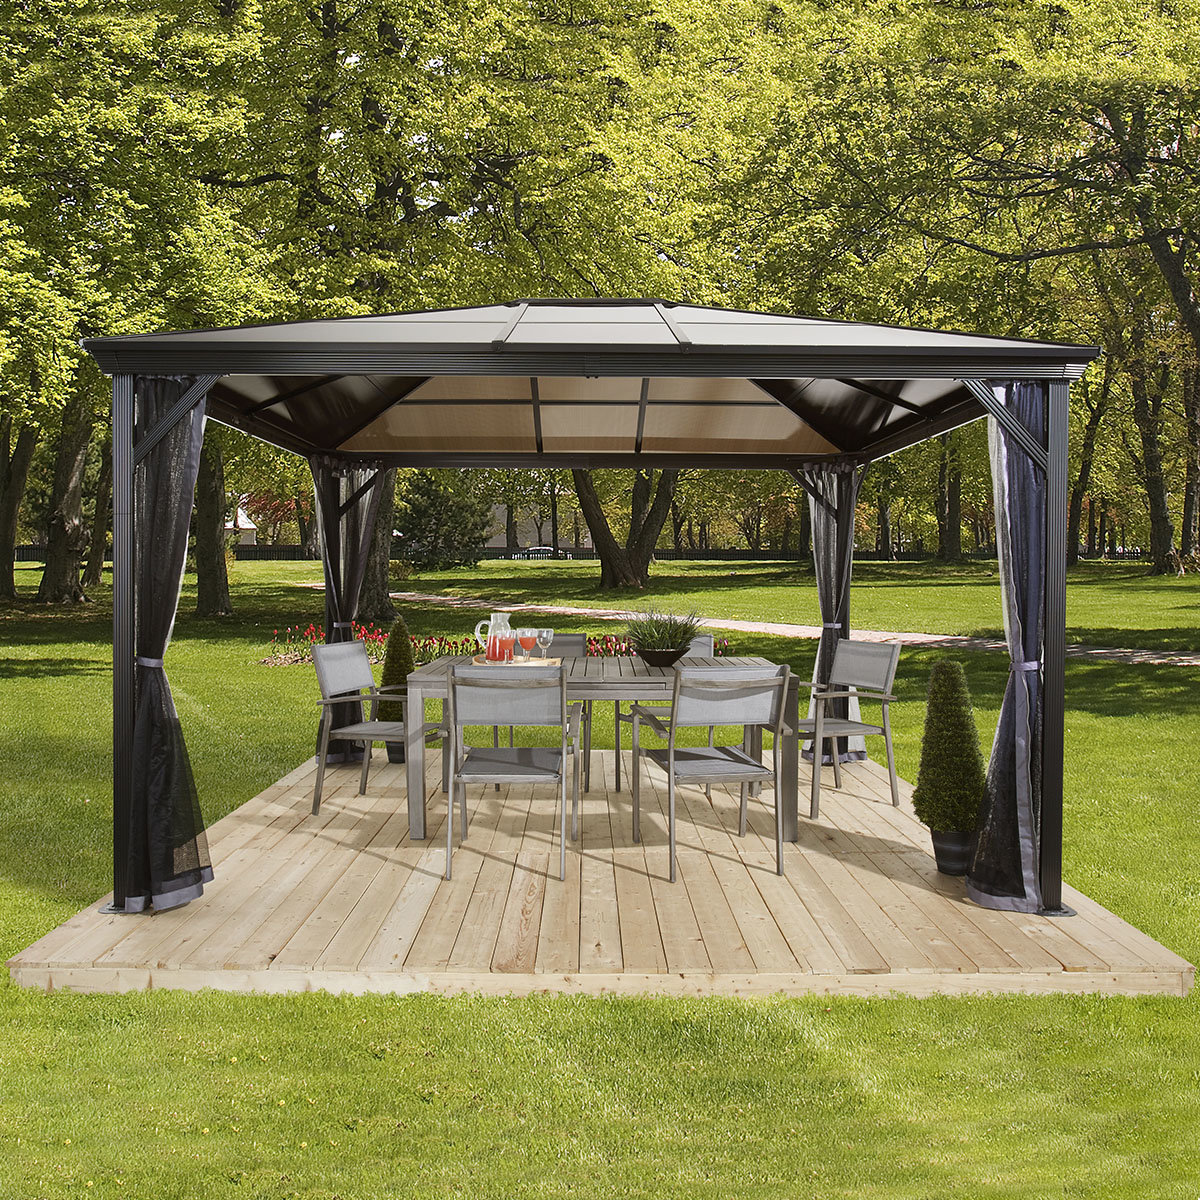 pavillon verona 10x10 online kaufen bei g rtner p tschke. Black Bedroom Furniture Sets. Home Design Ideas